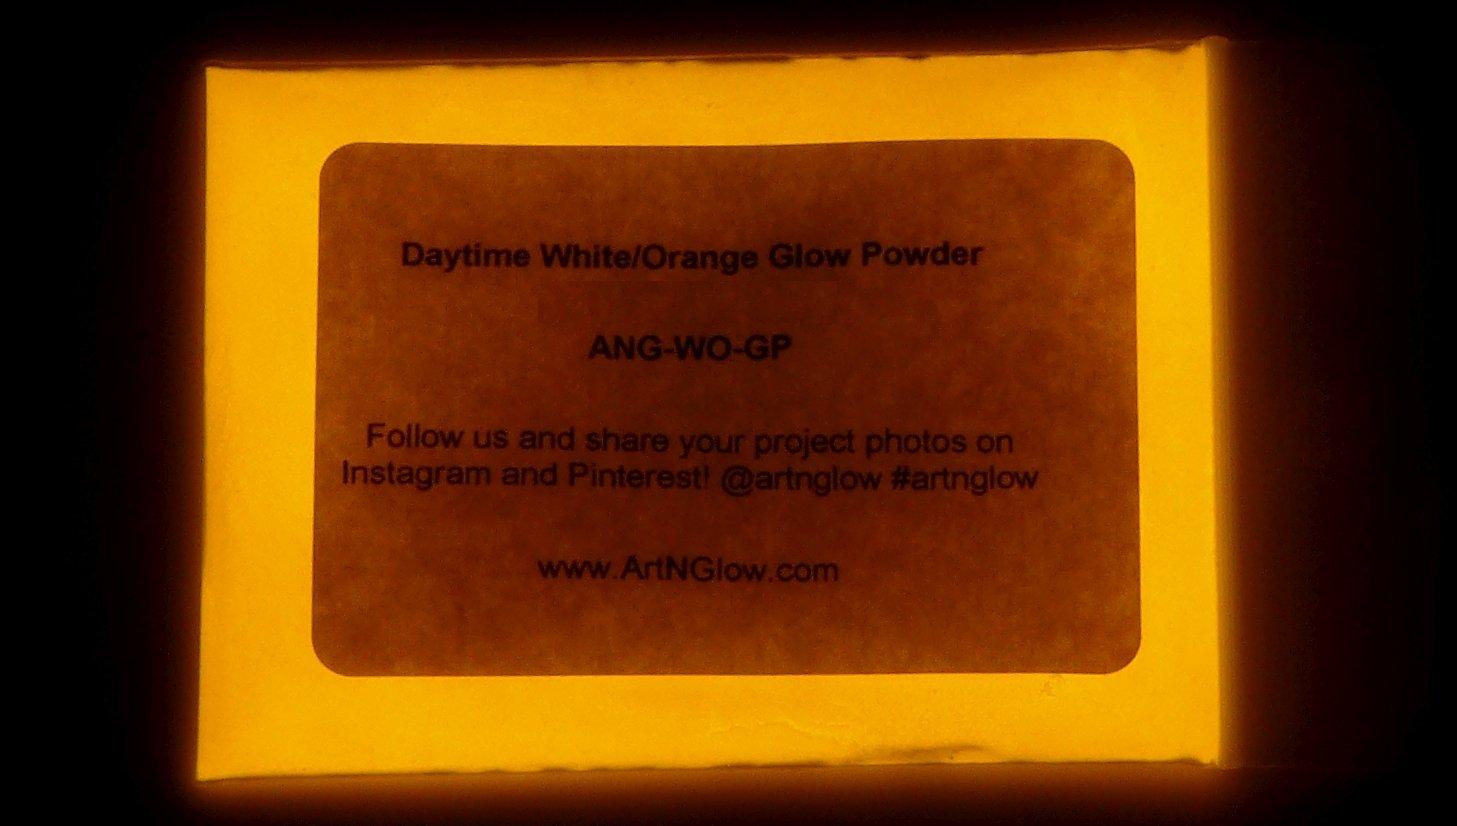 Neutral Orange Glow in The Dark Powder - 60g (2 Ounces) by Art 'N Glow